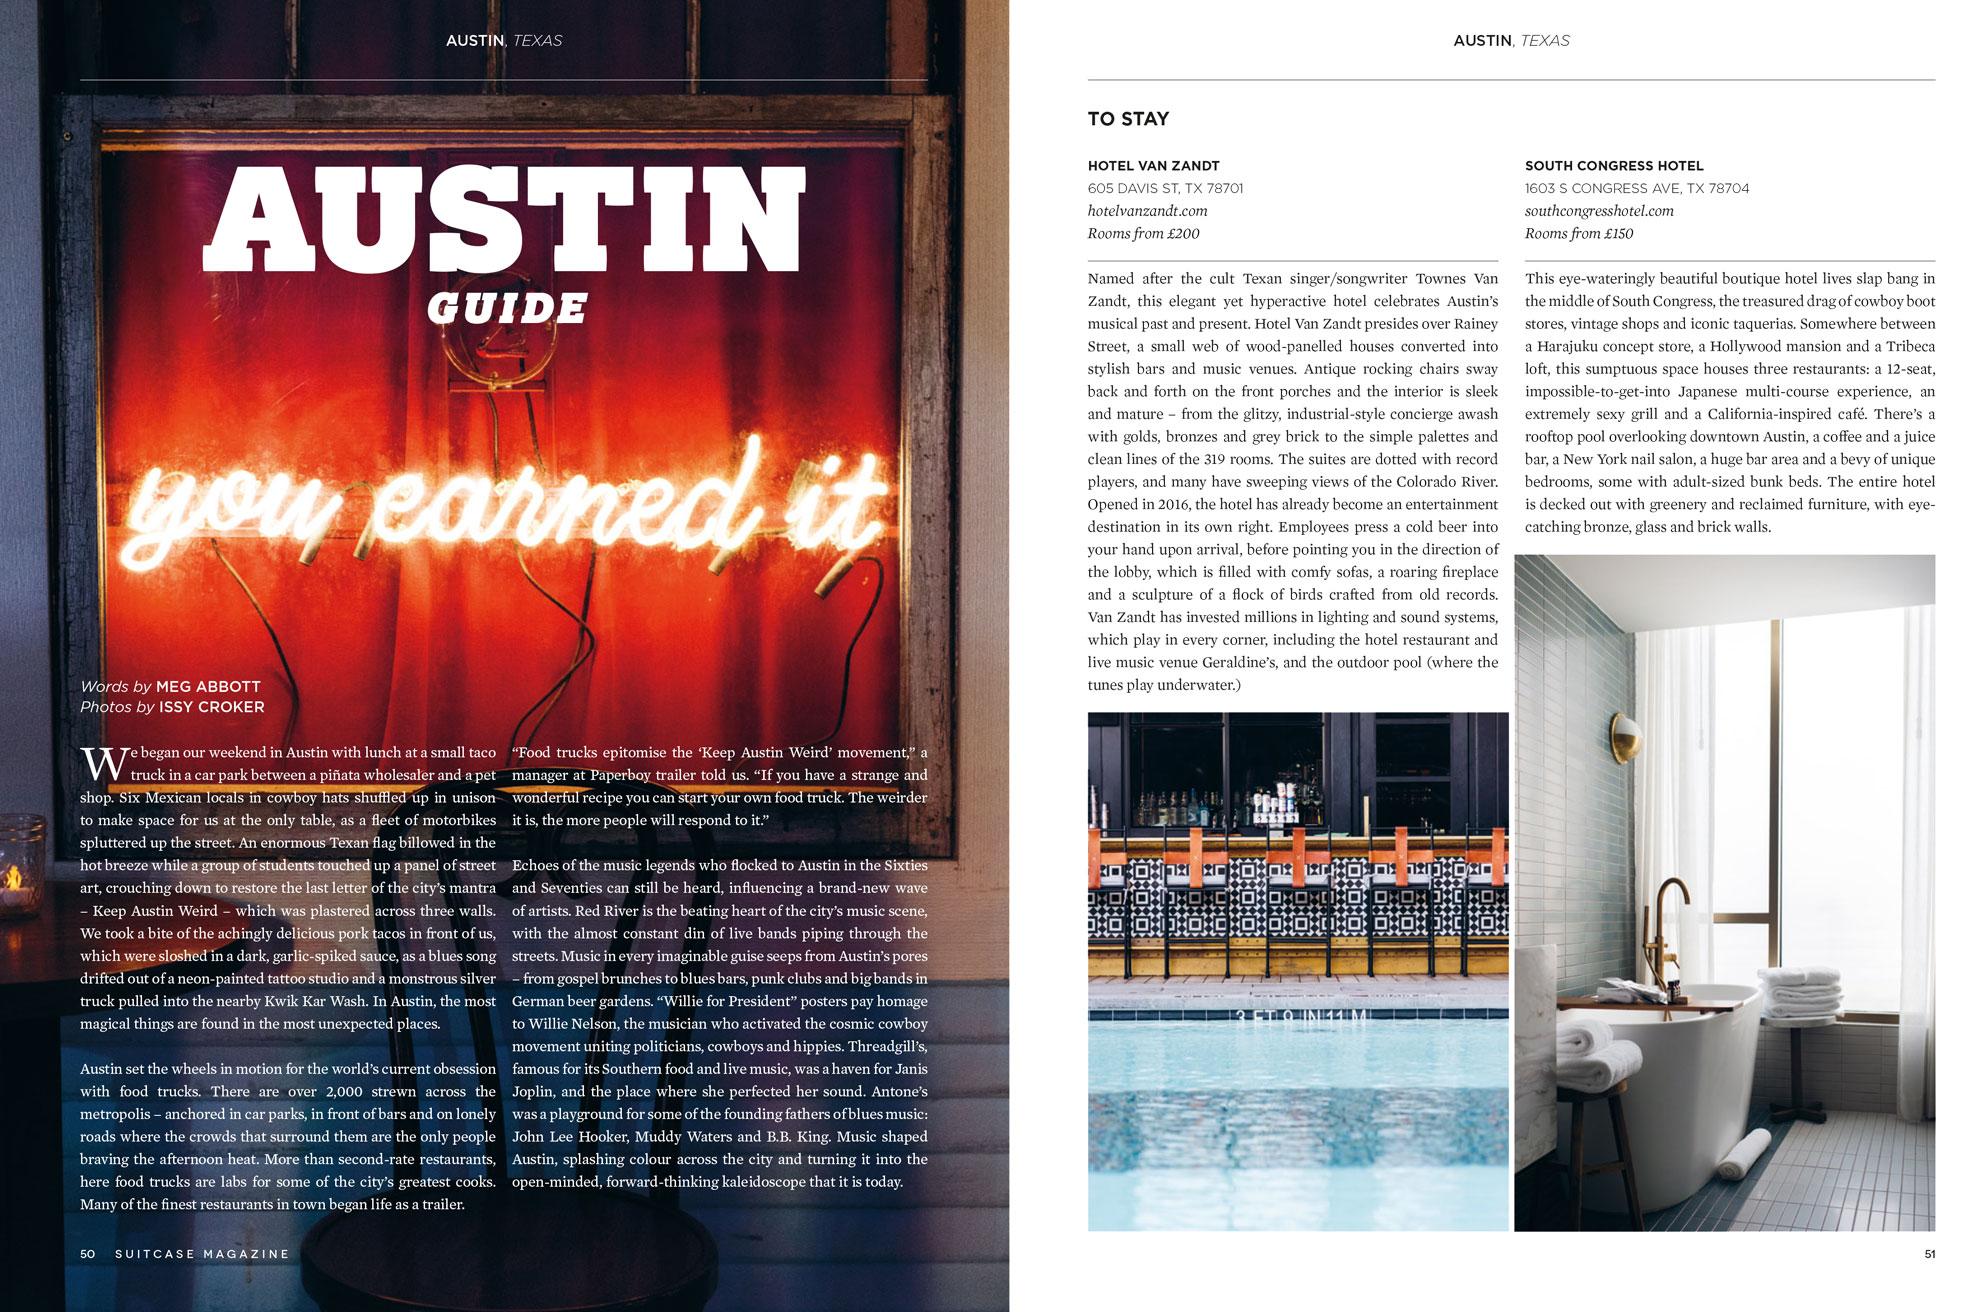 SUITCASE-Vol.16-Austin-Guide-1.jpg